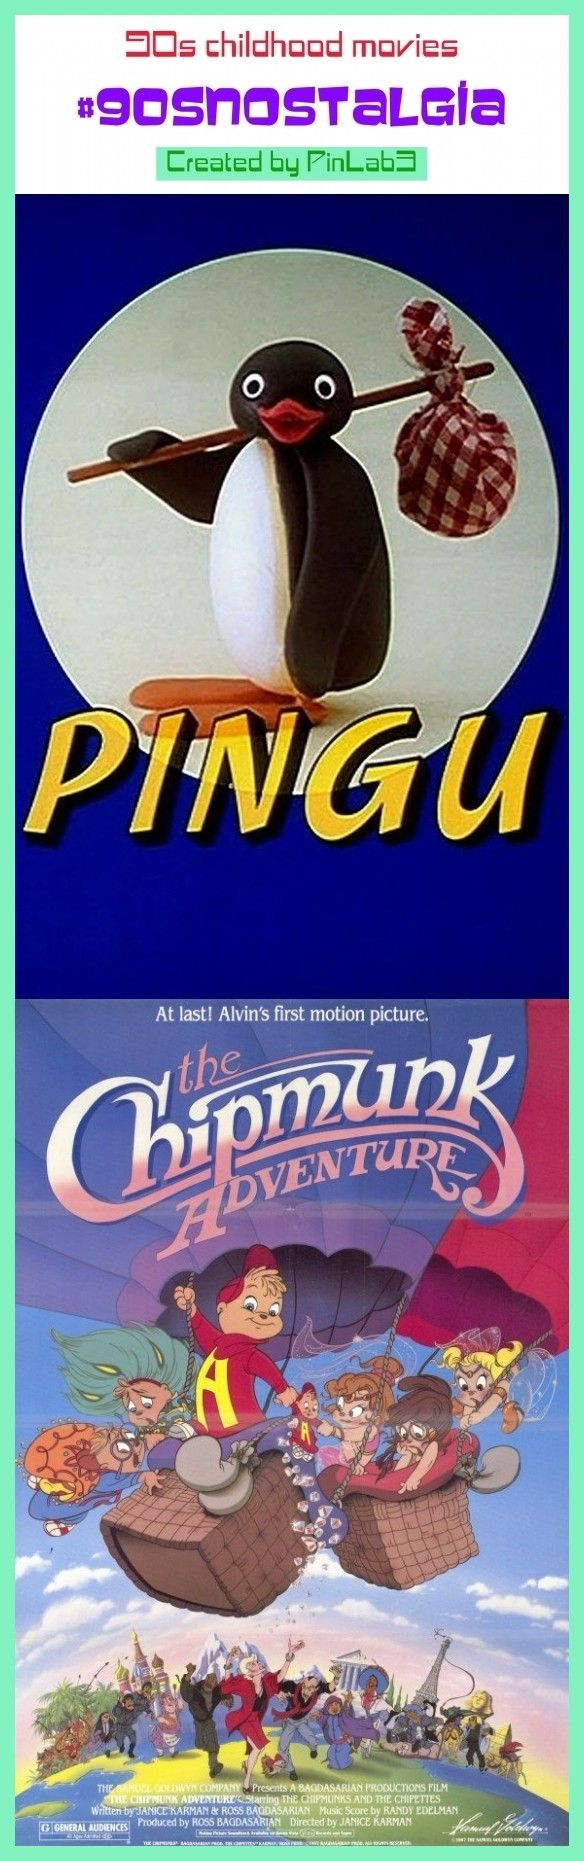 Kindheitsfilme